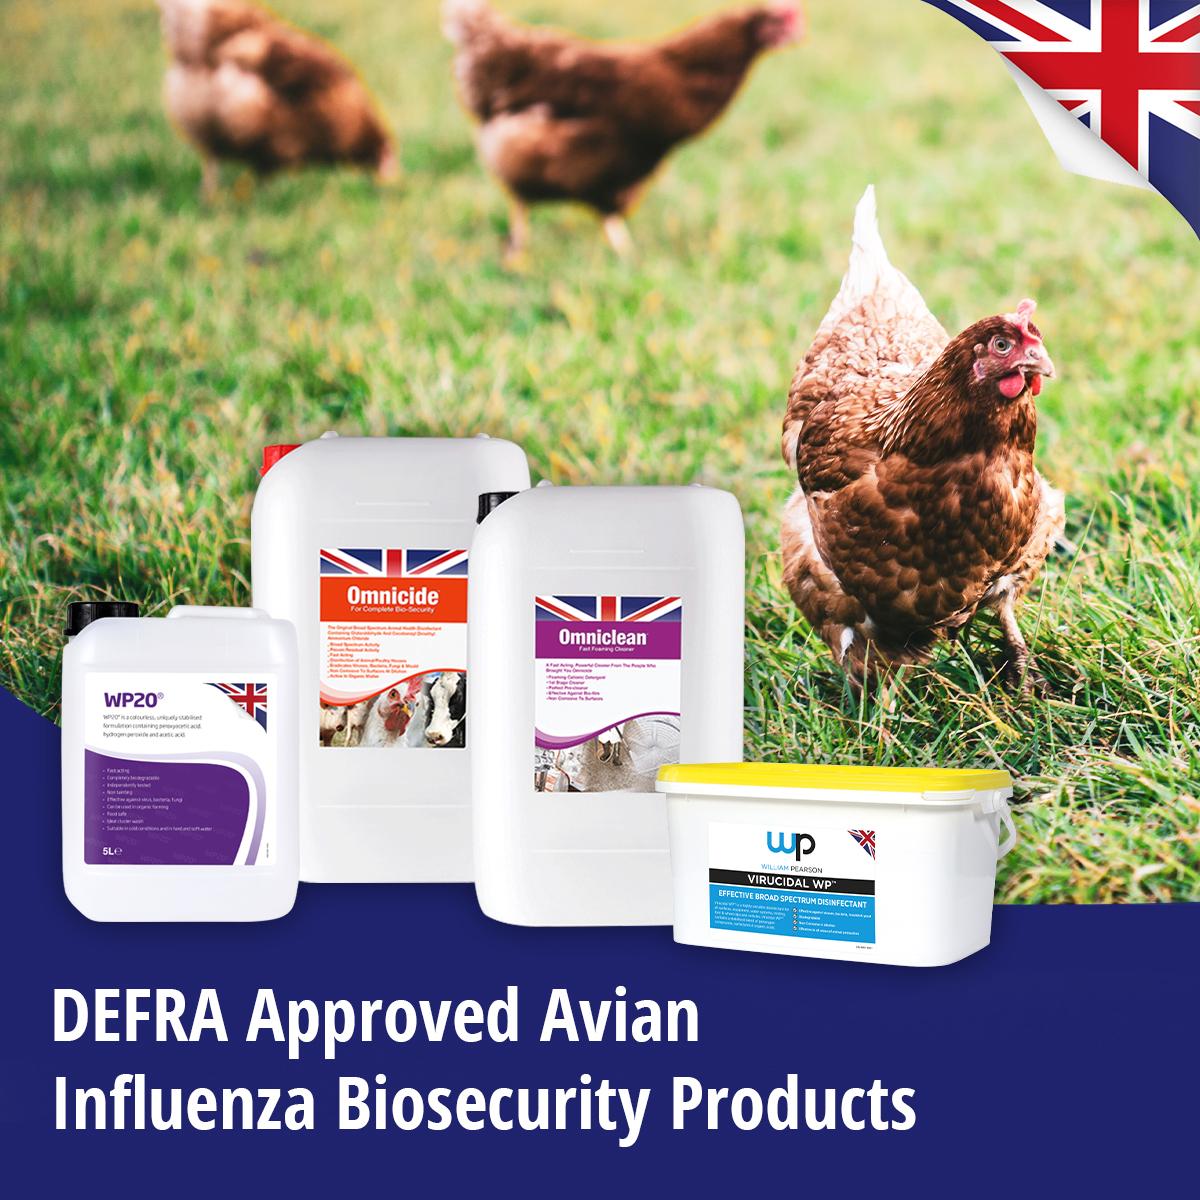 Avian Influenza (Bird Flu) Outbreak Prompts Tougher Restrictions